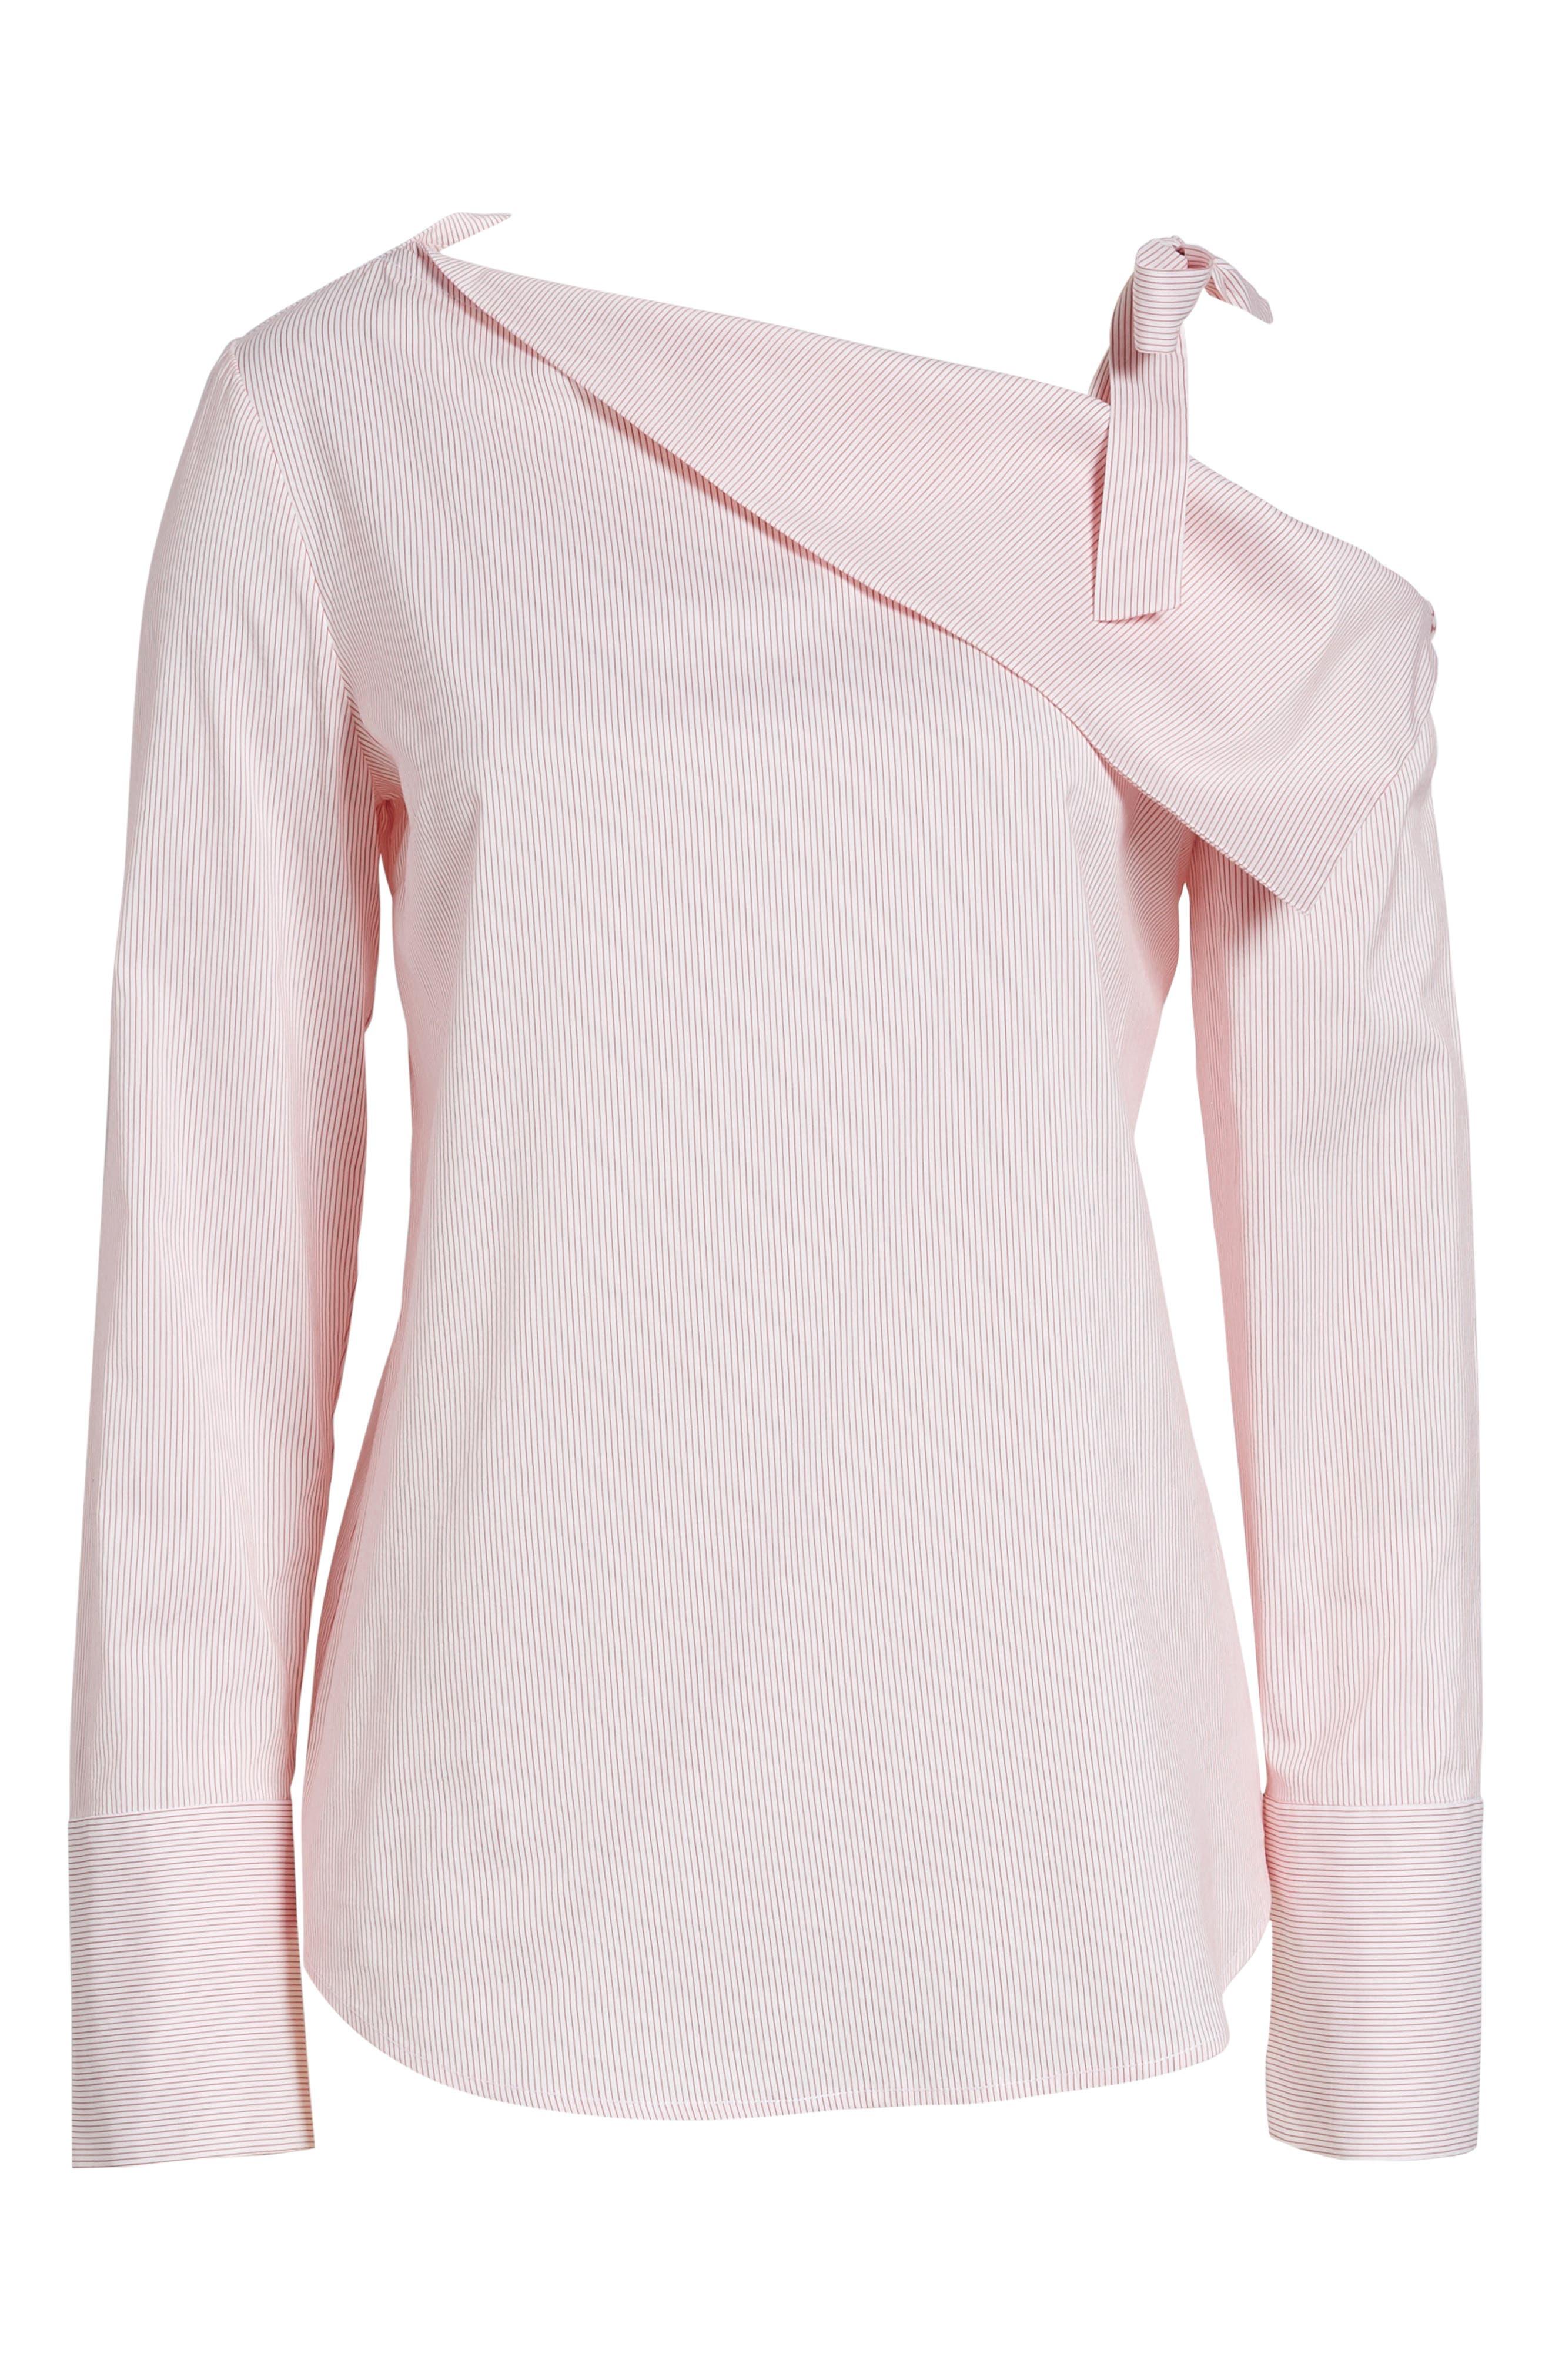 One-Shoulder Shirt,                             Alternate thumbnail 7, color,                             Pink Honey Chic Stripe